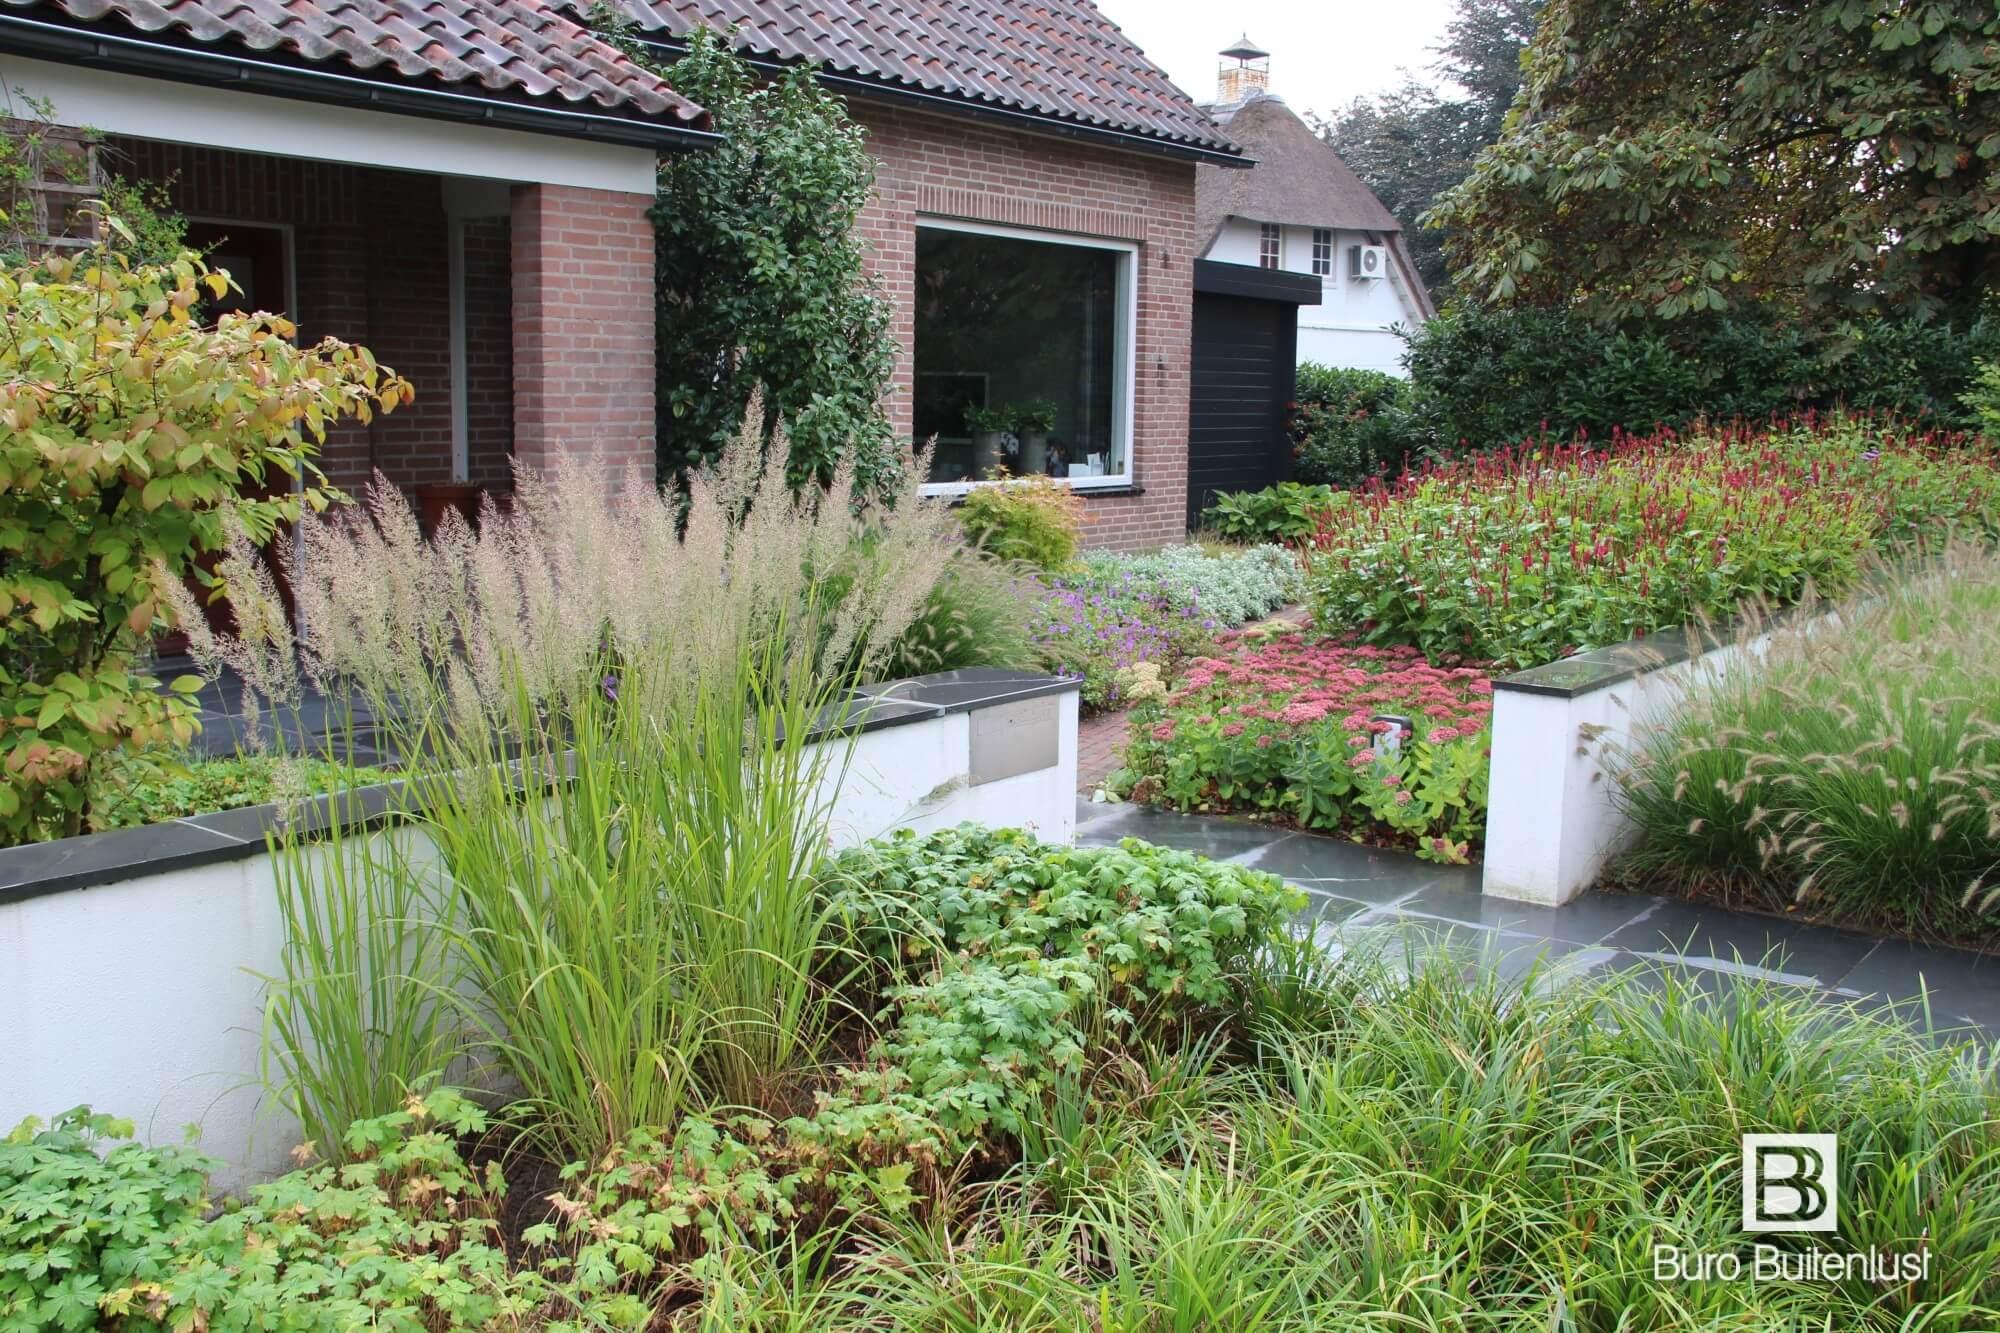 Moderne plantentuin buro buitenlust for Modernes buro